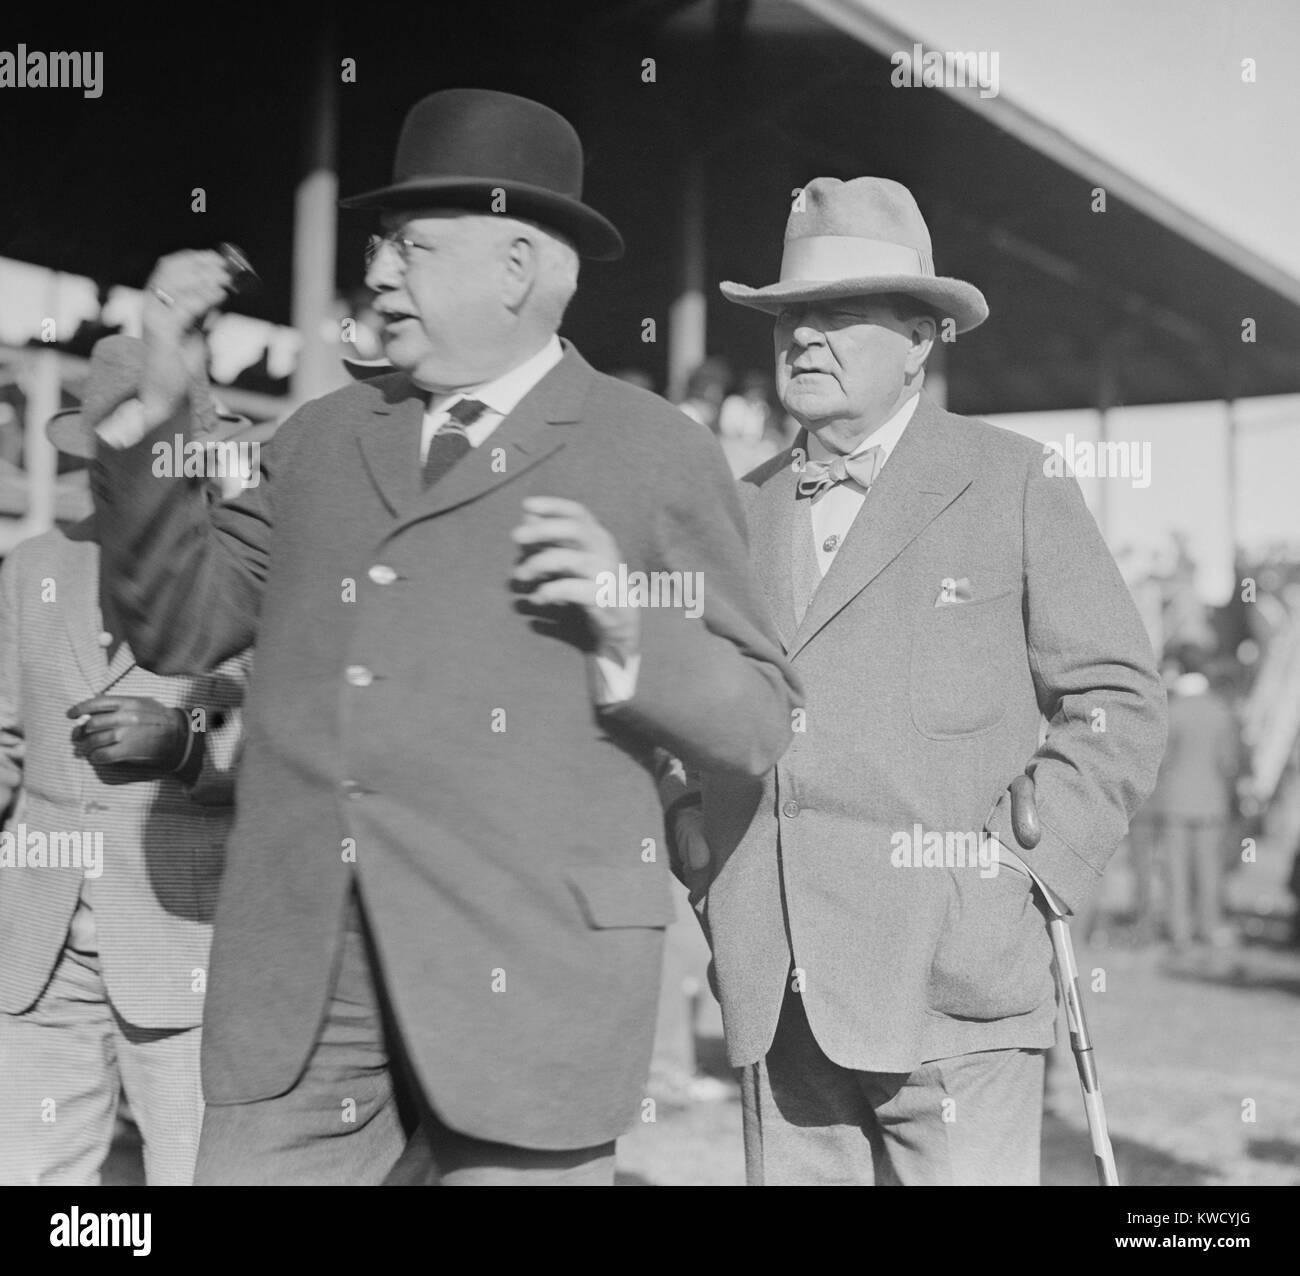 Diamond Jim Brady, an American businessman, financier, and philanthropist, c. 1900. The 1935 film DIAMOND JIM by - Stock Image